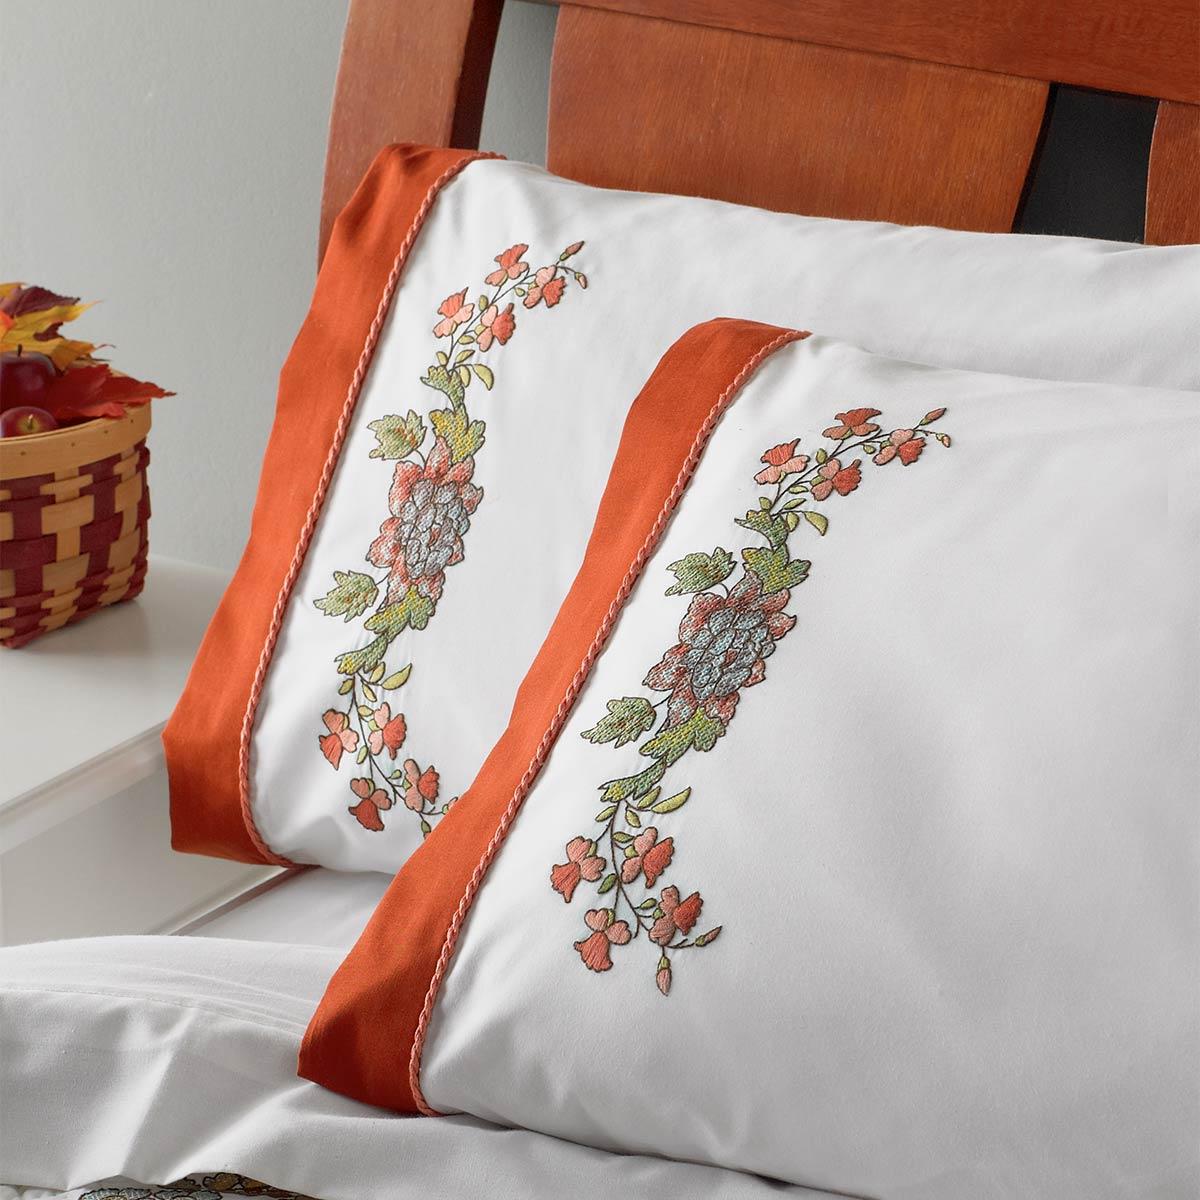 Bucilla ® Waverly ® Charleston Chirp Collection Stamped Pillowcase Pair